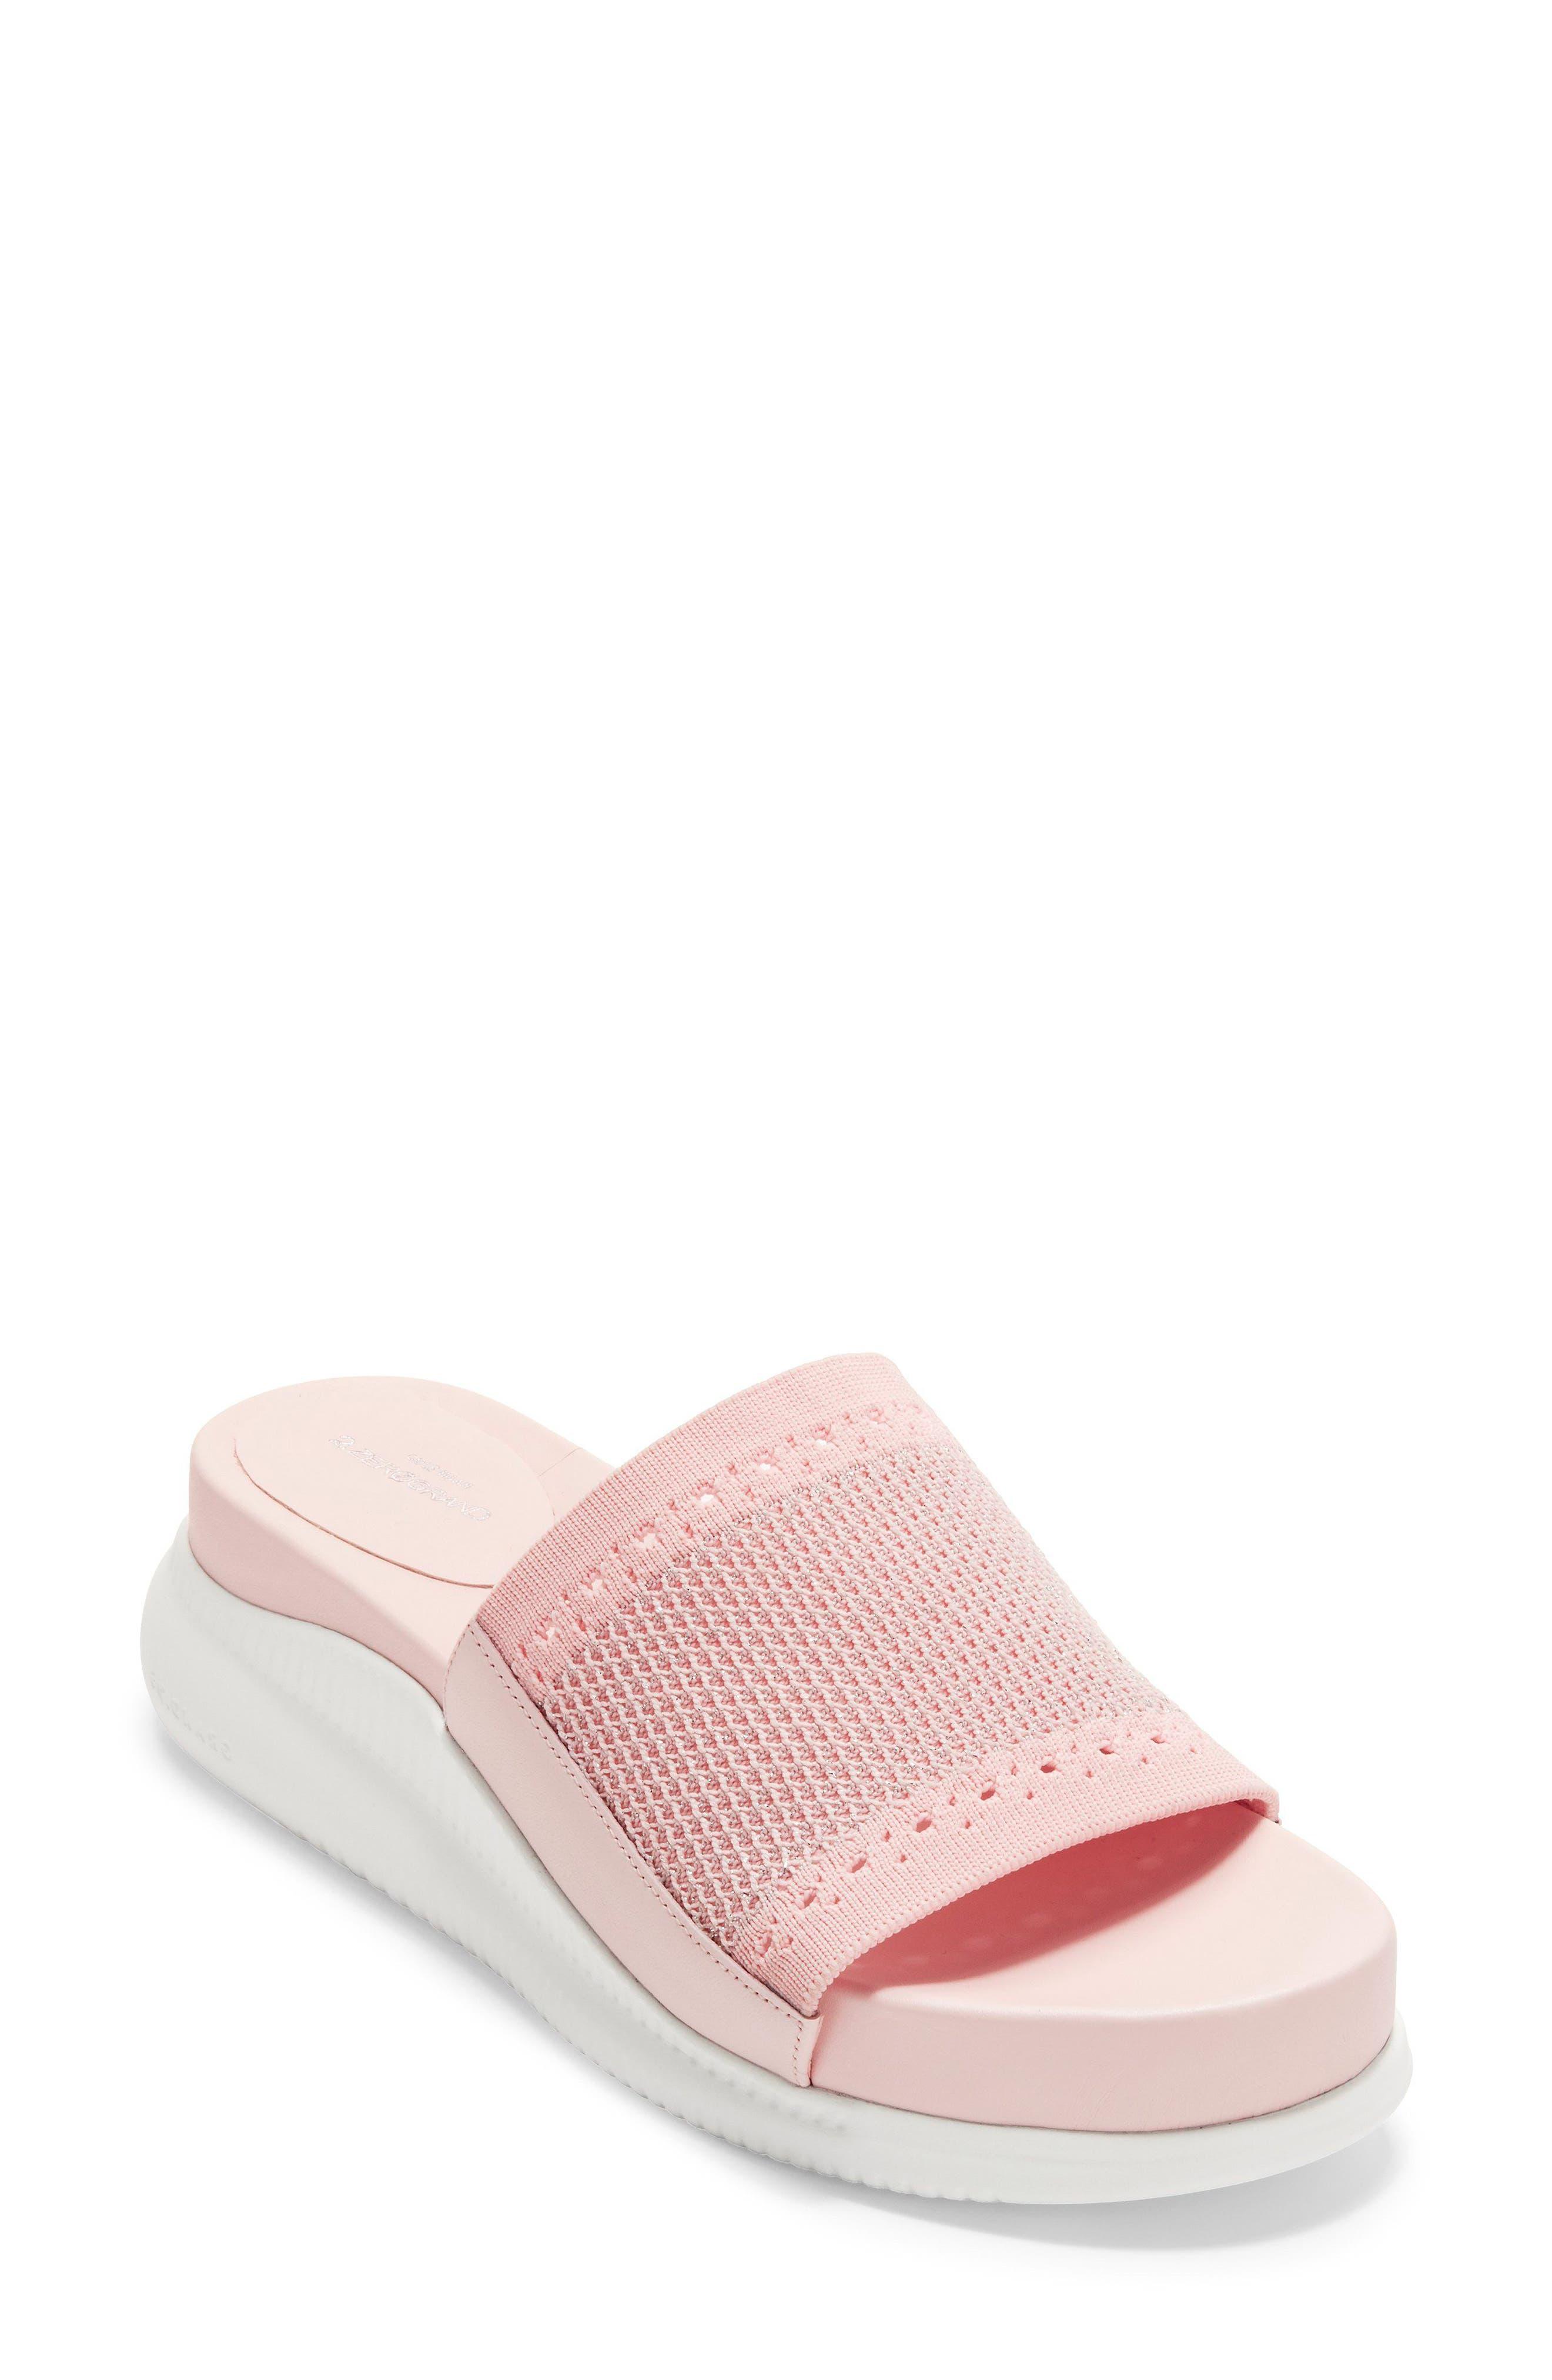 Cole Haan 2.Zerogrand Stitchlite™ Slide Sandal (Women)